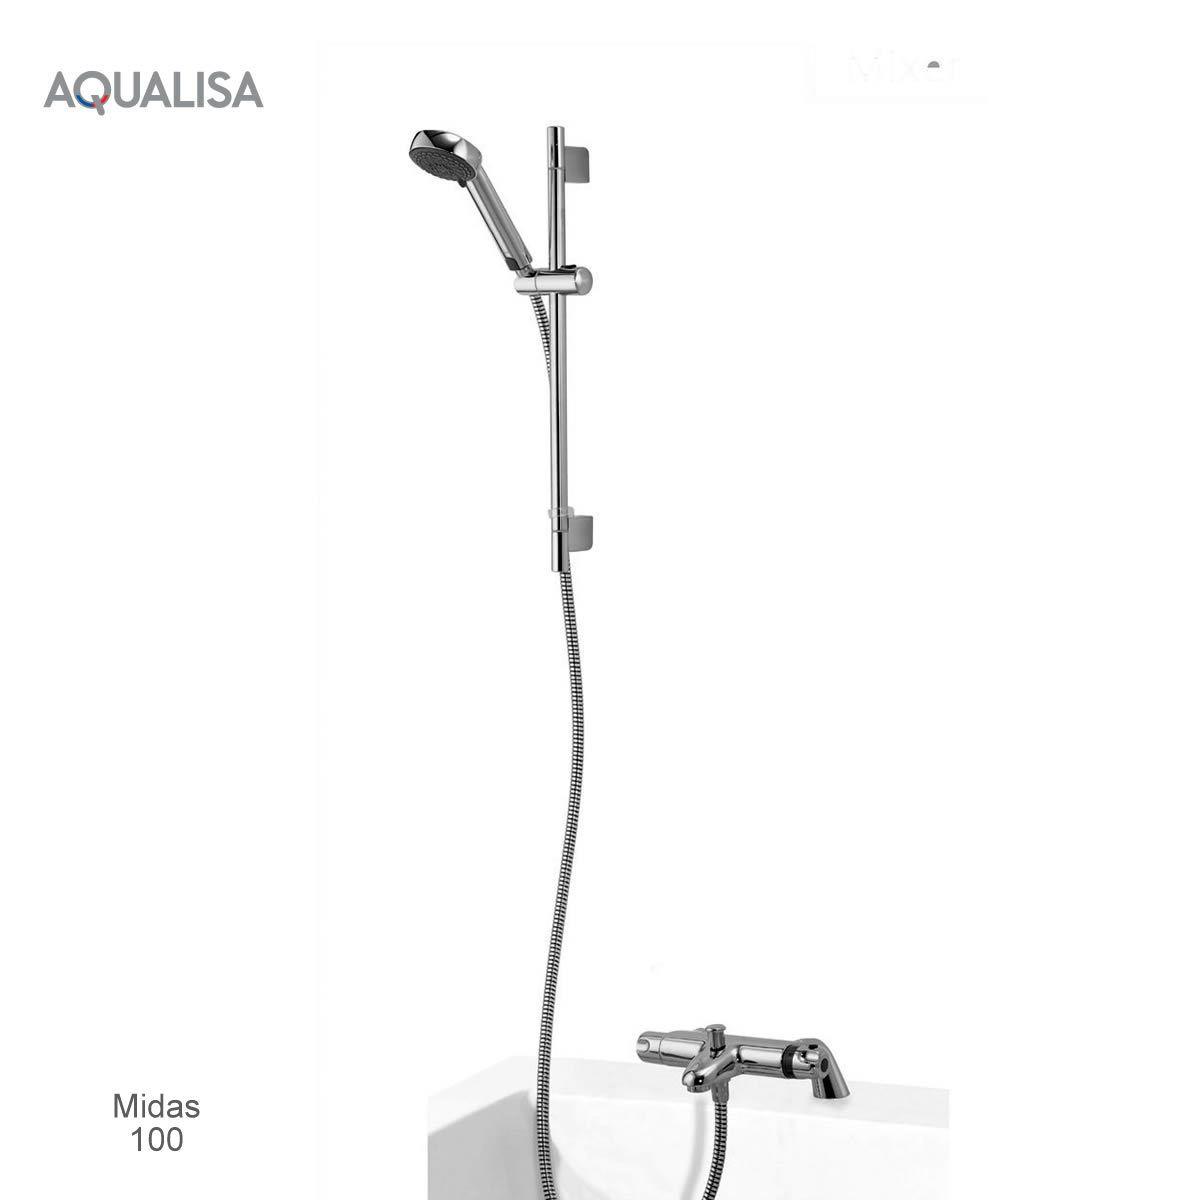 Aqualisa Midas Thermostatic Bath Shower Mixer Set Uk